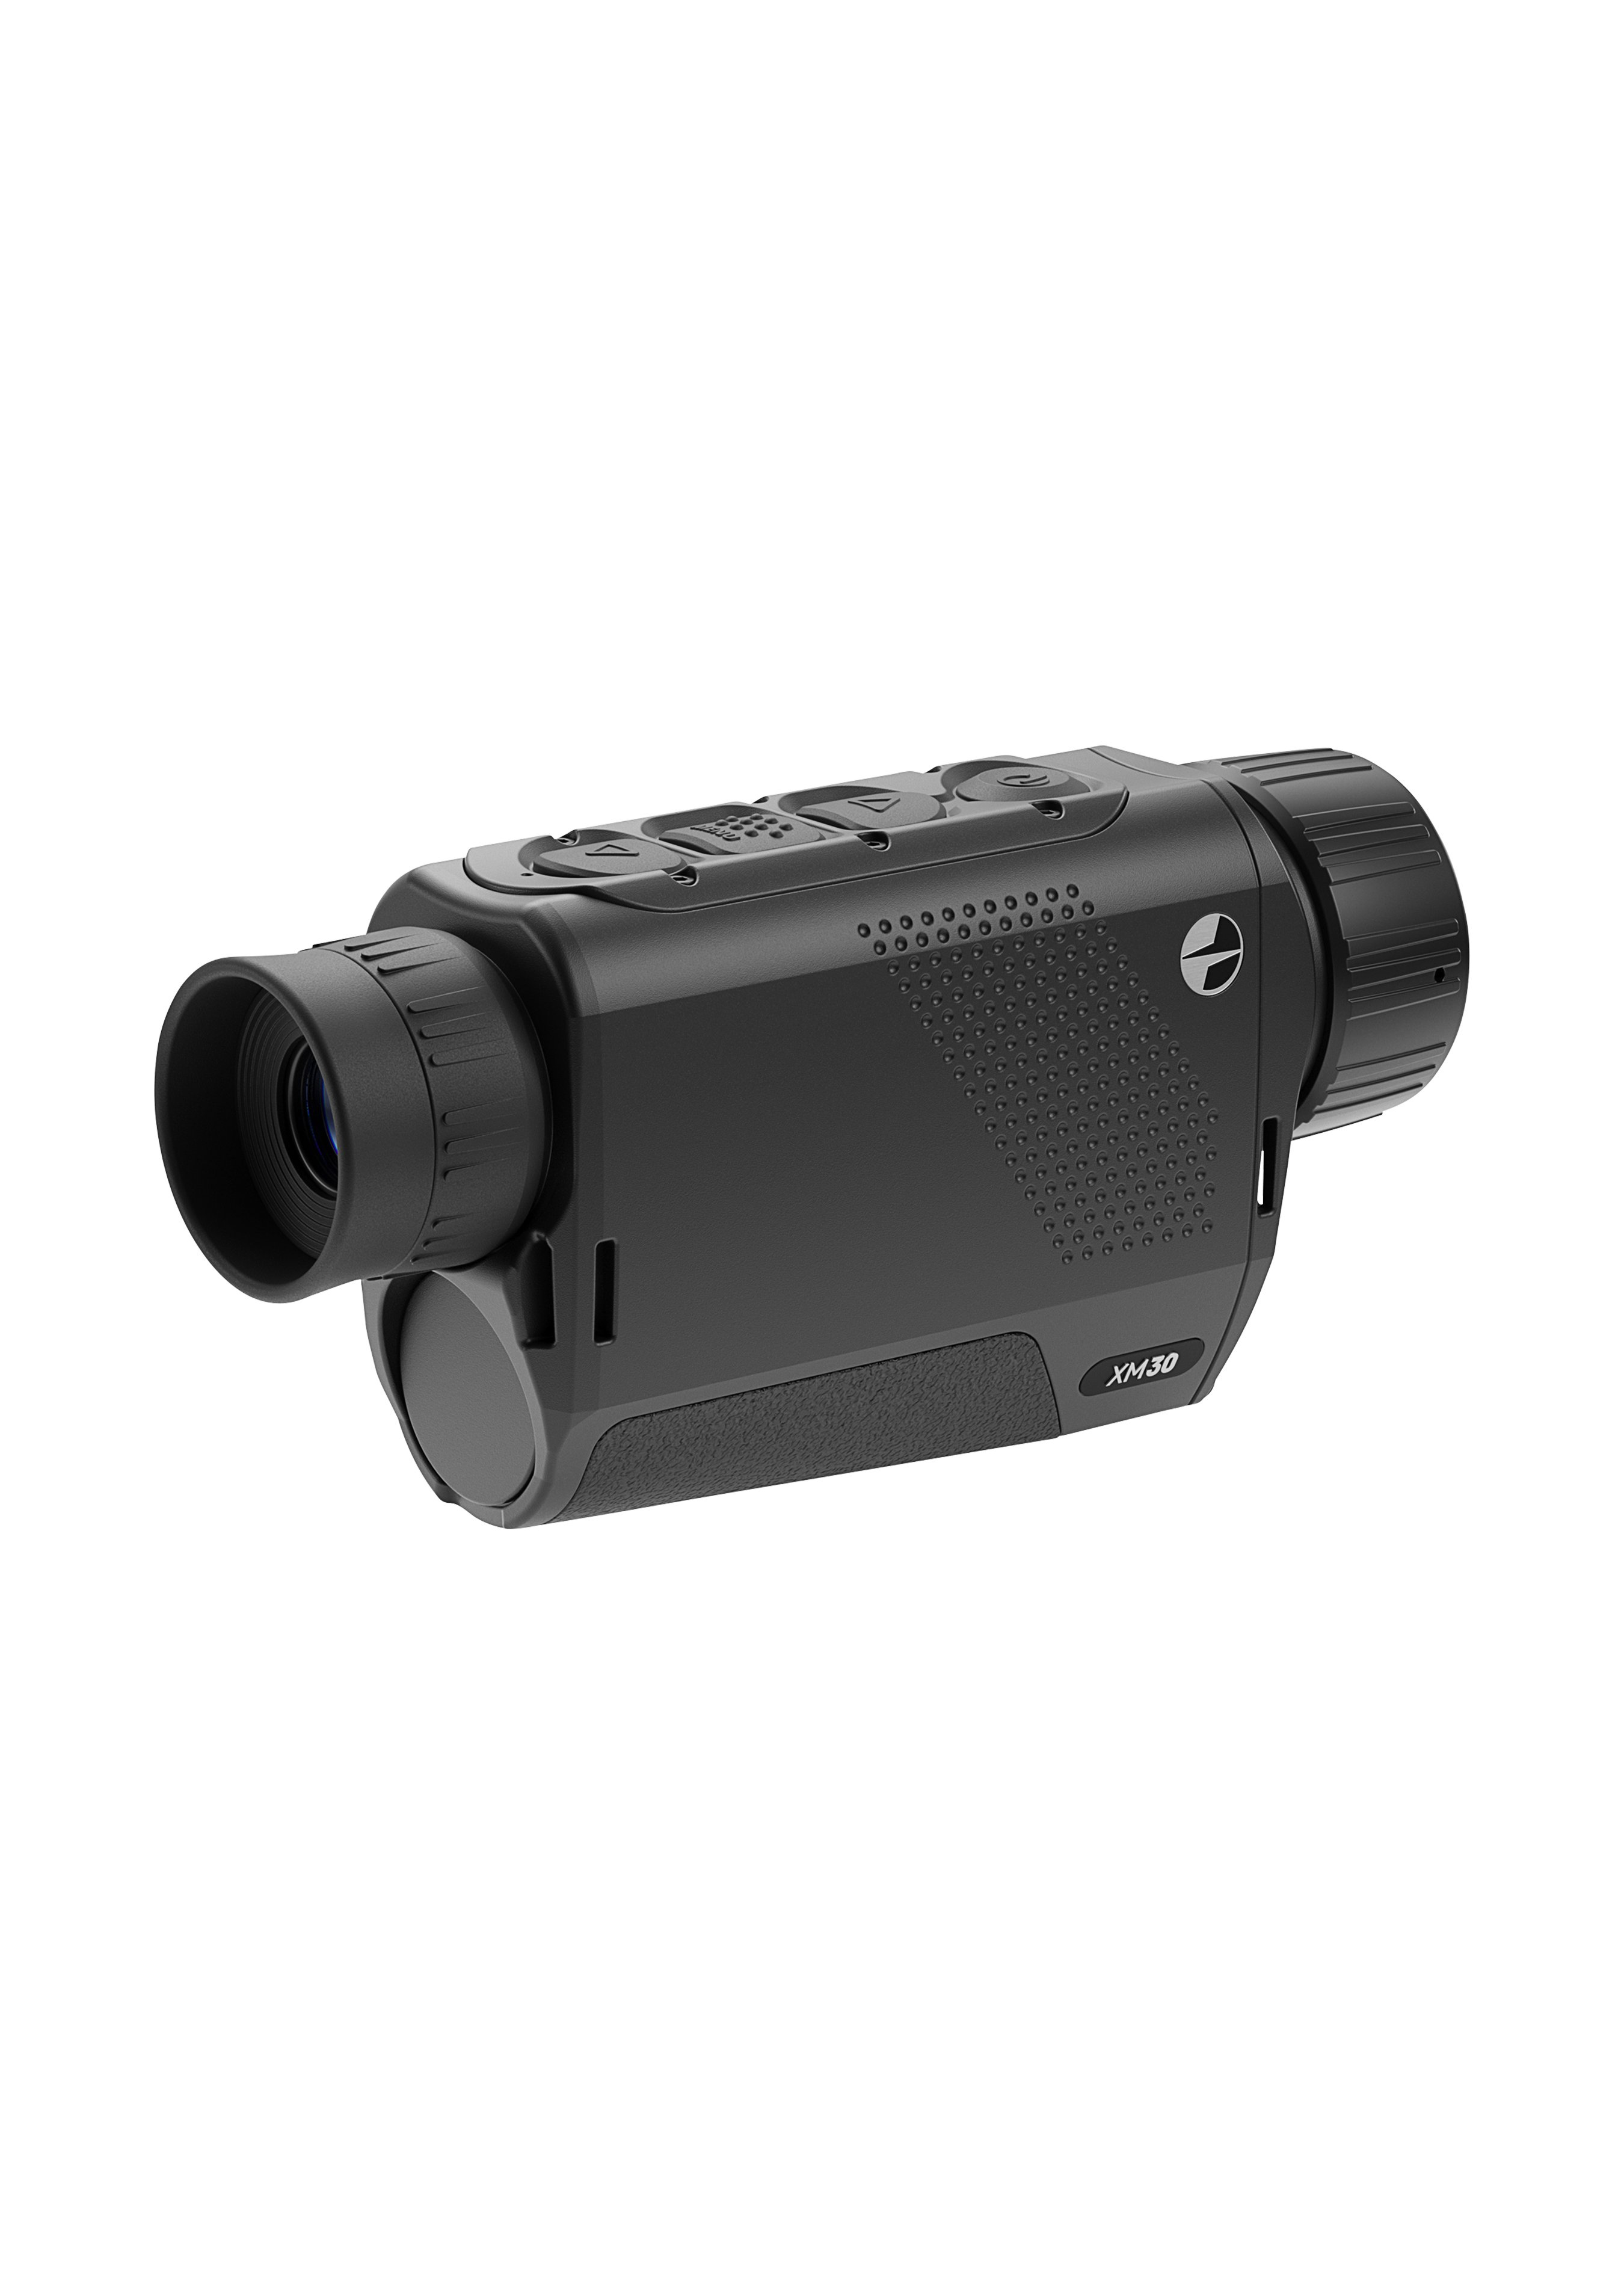 Caméra thermique Axion Key XM 30 244310 2